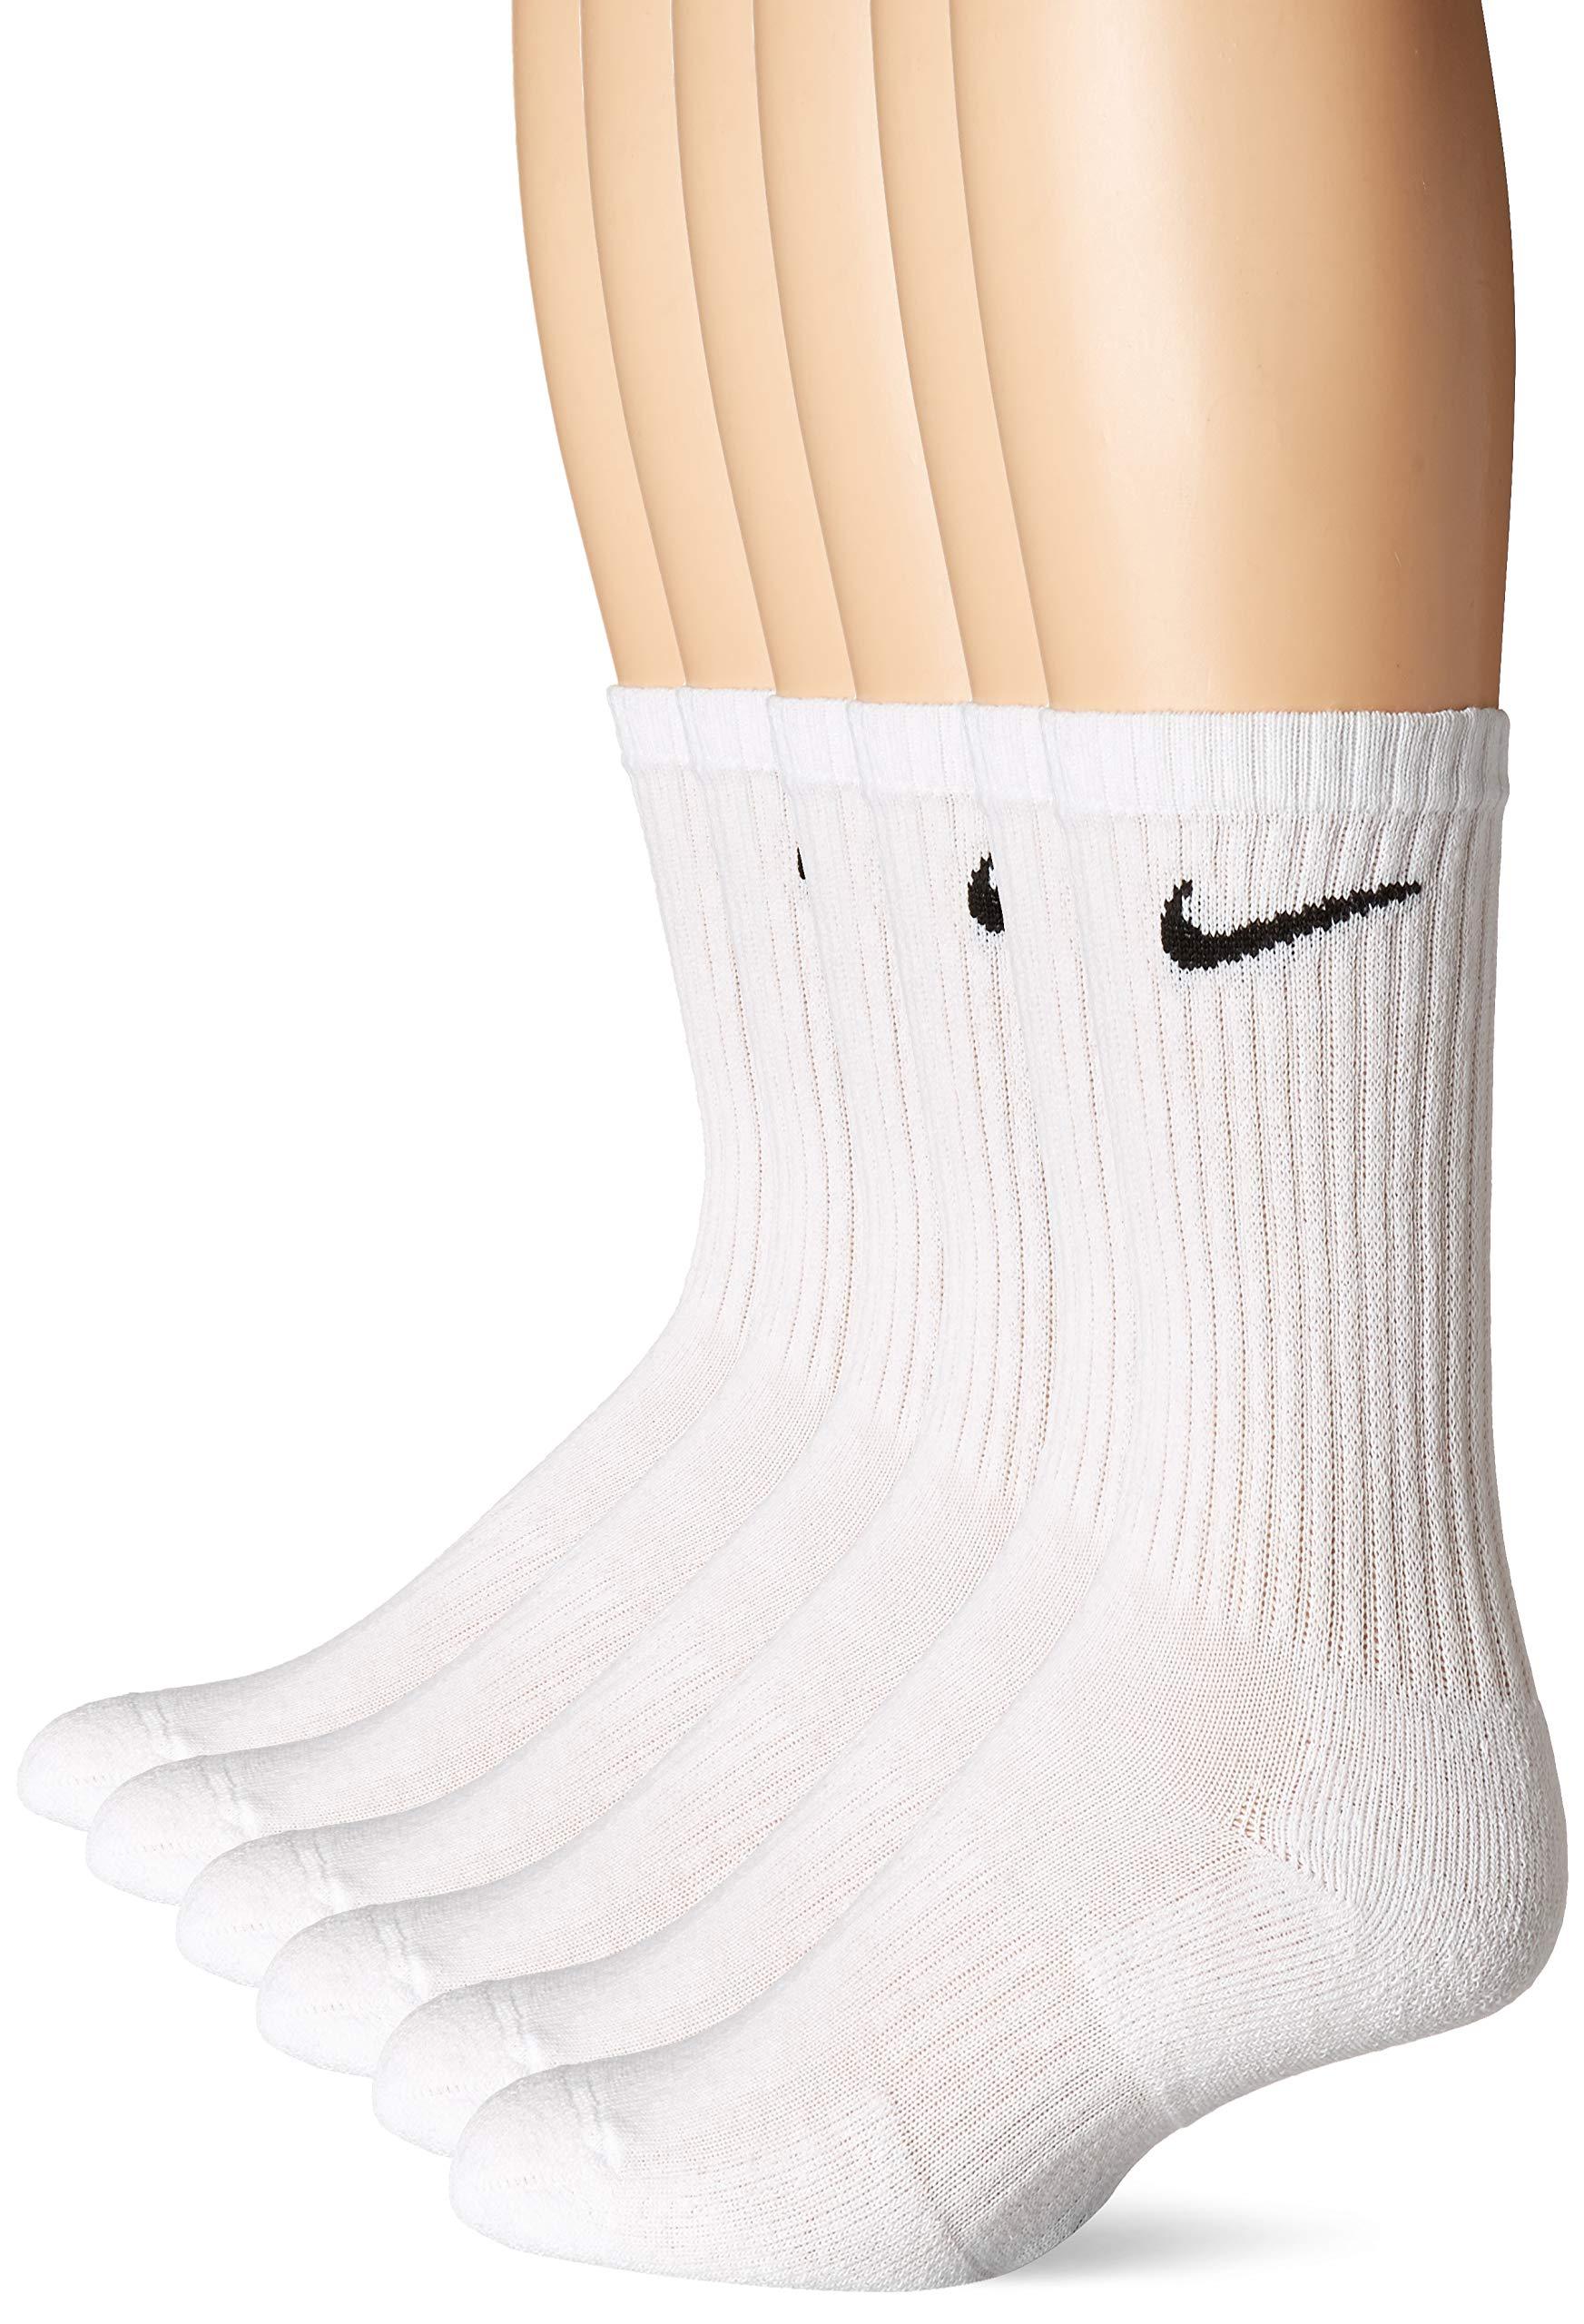 Nike Everyday Cushion Crew Socks, Unisex Nike Socks, White/Black, L (Pack of 6 Pairs of Socks) by Nike